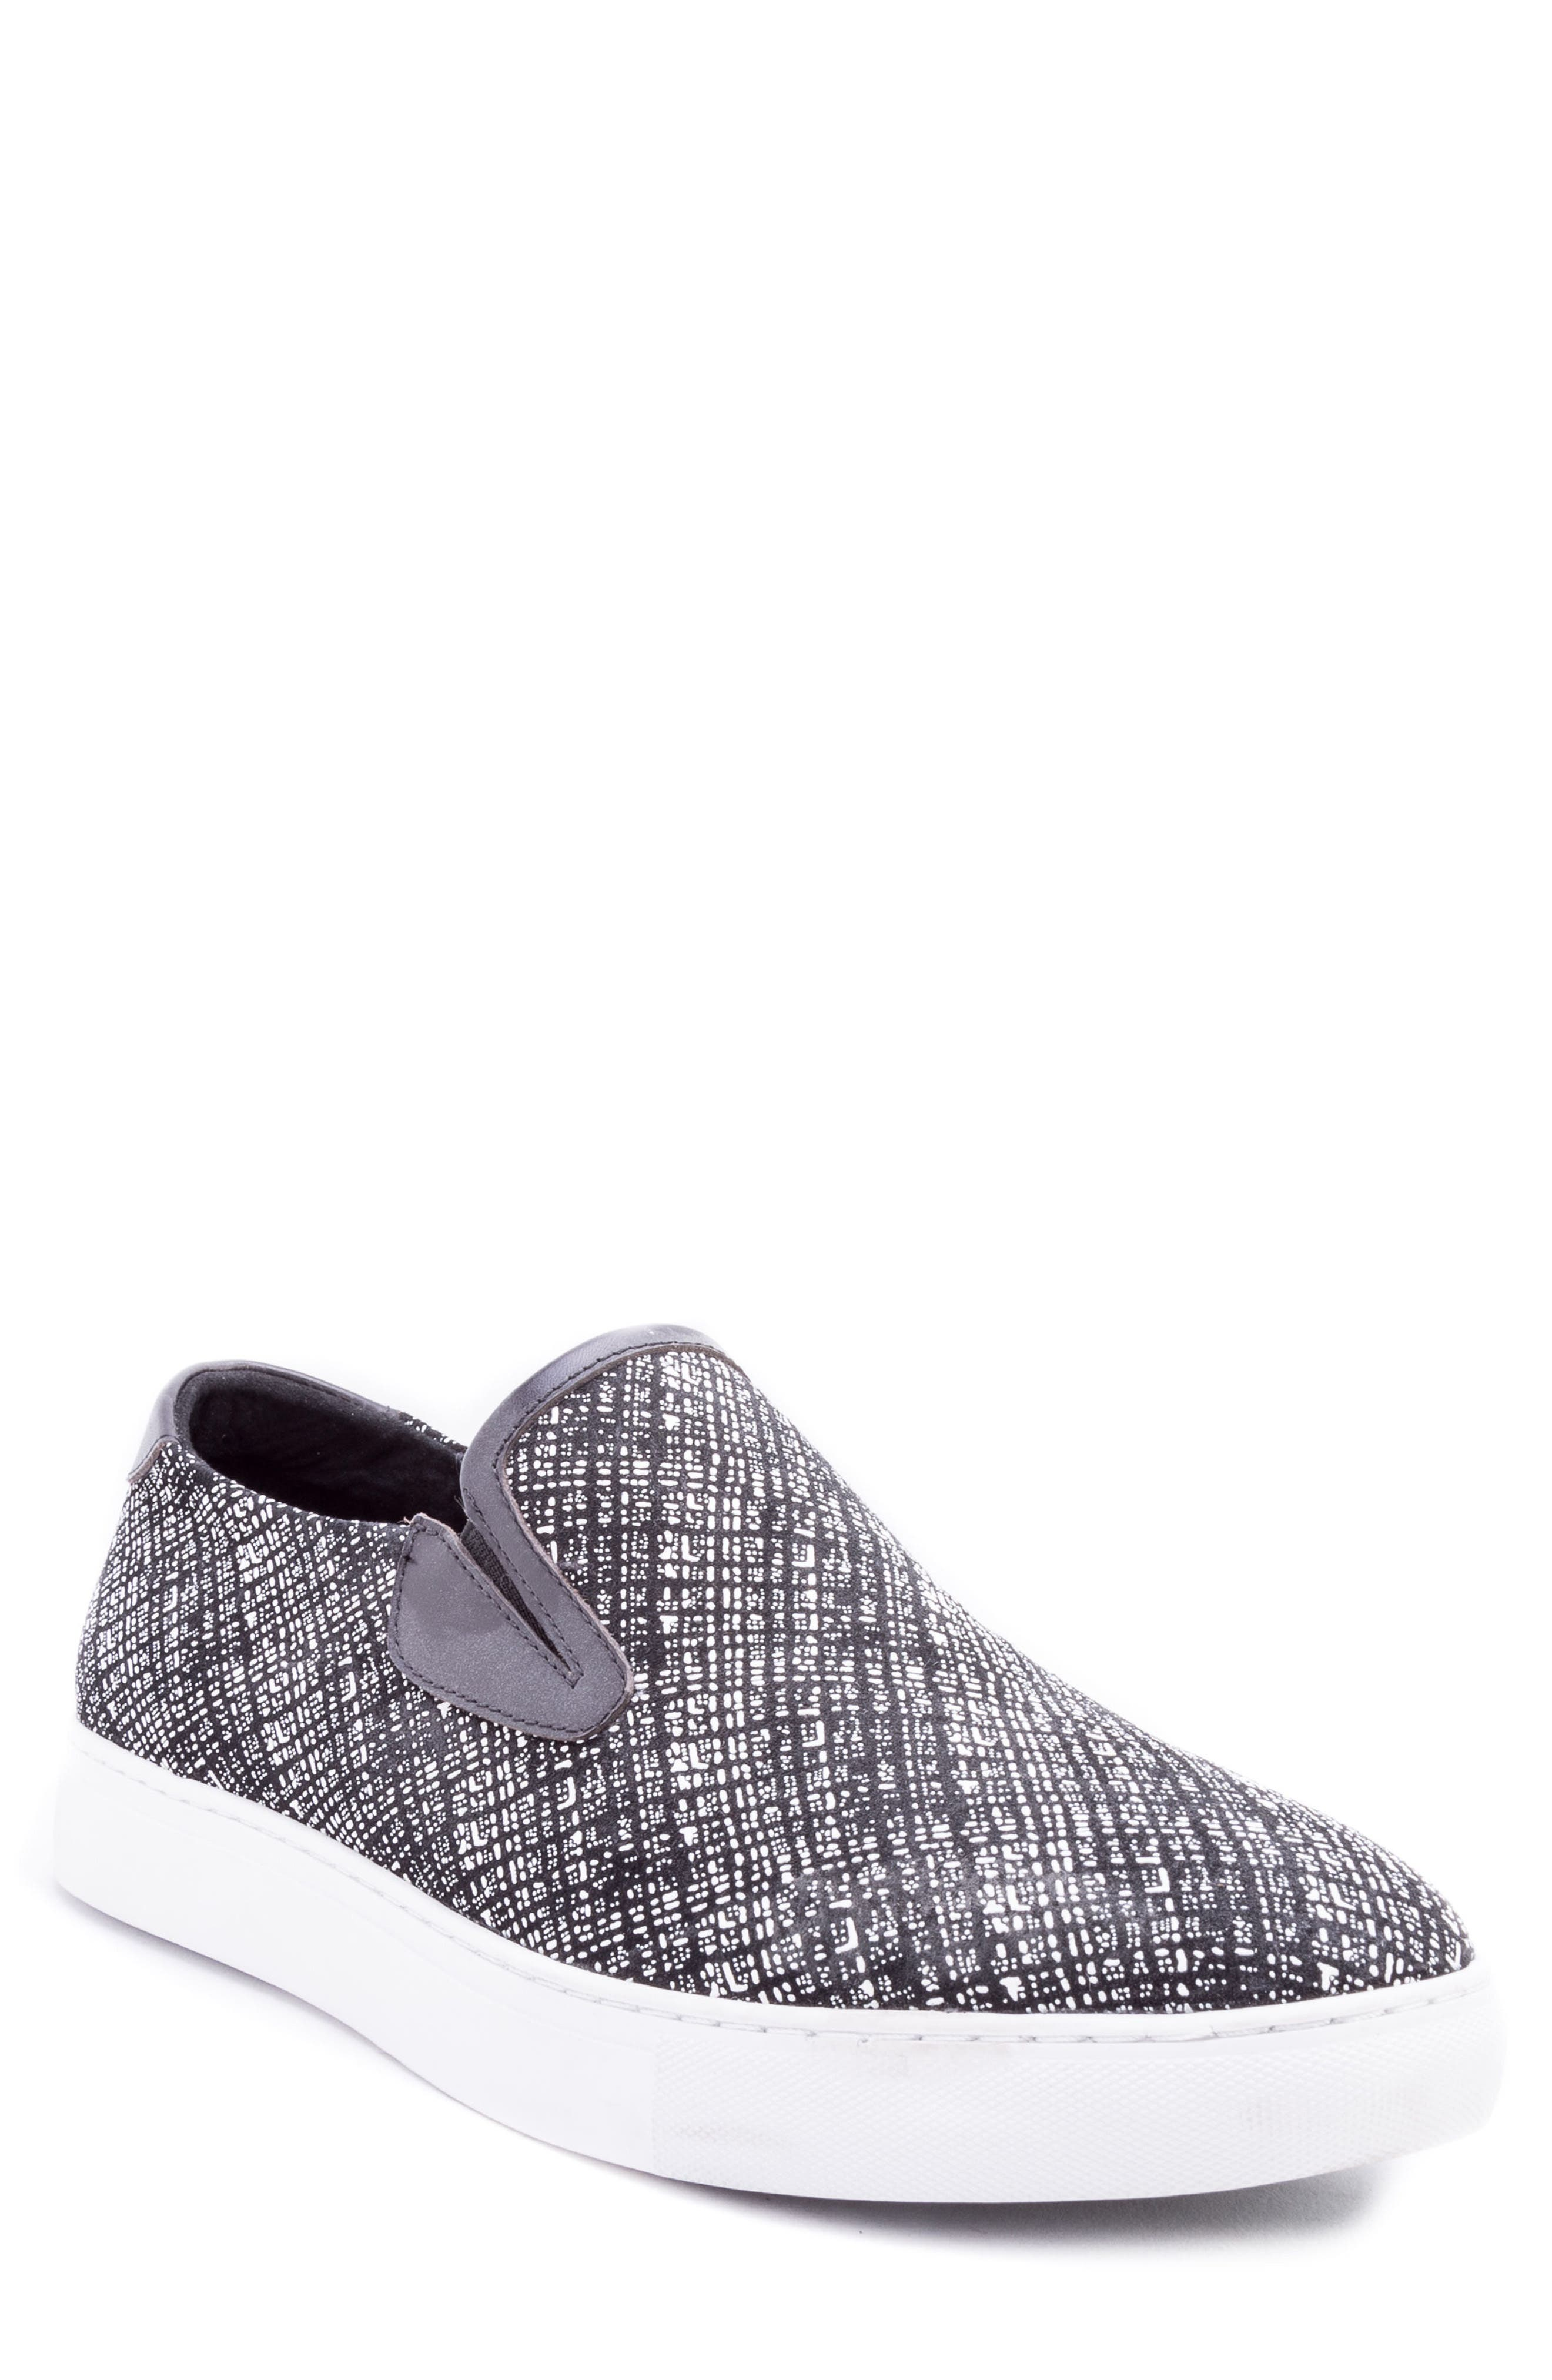 Kitson Slip-On Sneaker,                         Main,                         color, BLACK SUEDE